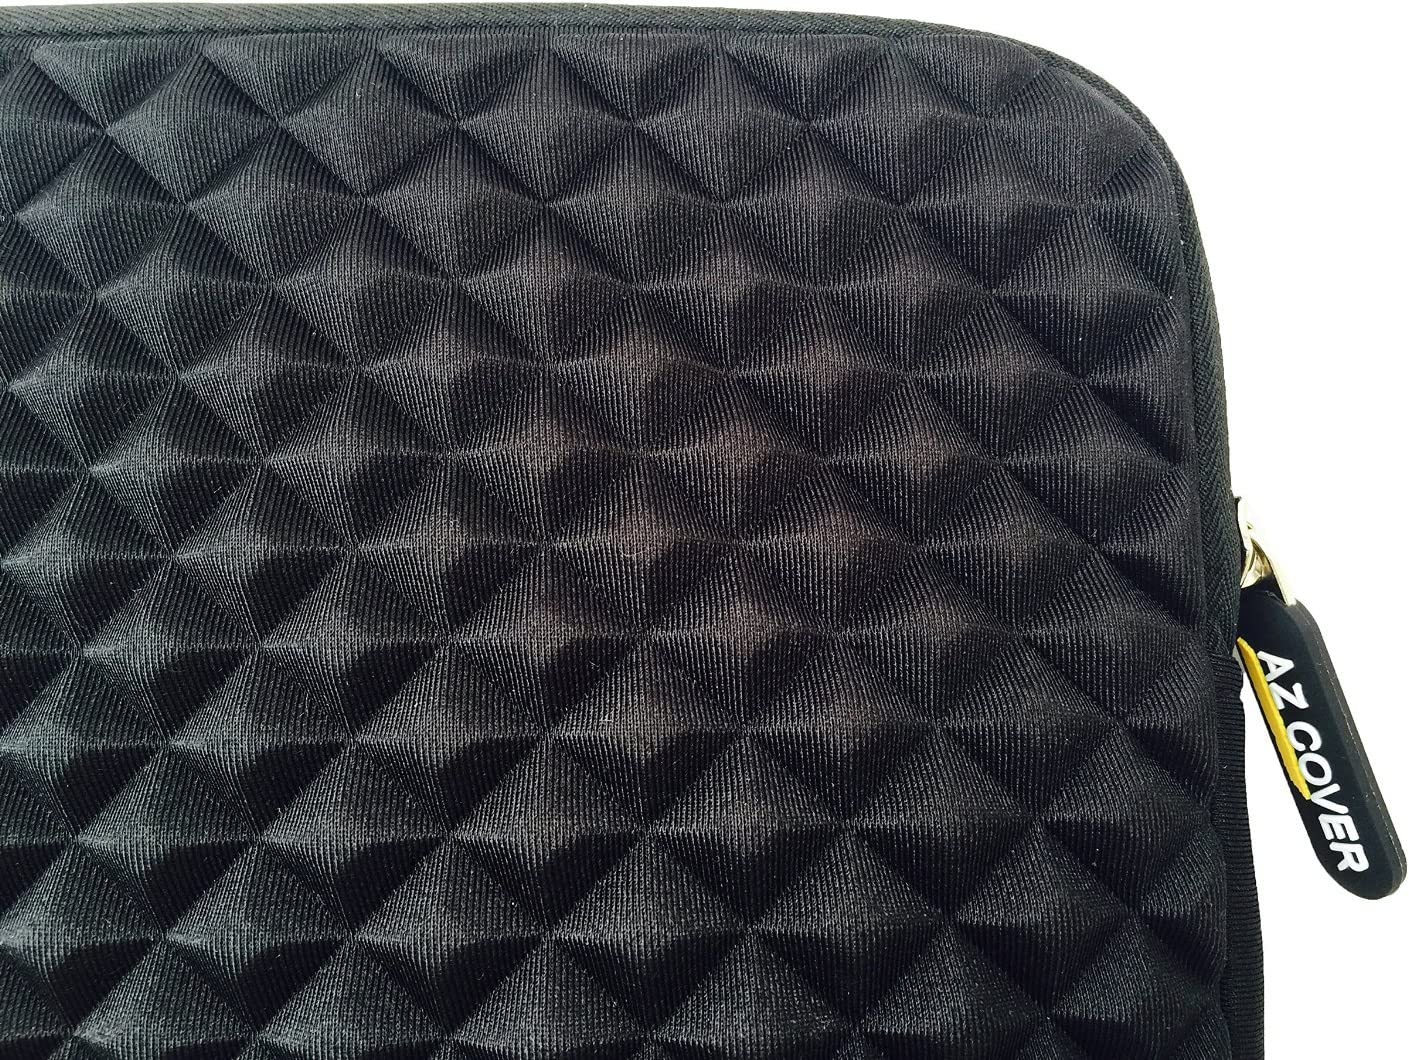 AZ-Cover 11-Inch Bag Simplicity /& Stylish Diamond Foam Shock-Resistant Neoprene Sleeve Black For Acer Aspire NX.M89AA.009//V5-131-2680 11.6-Inch Notebook PC Laptop